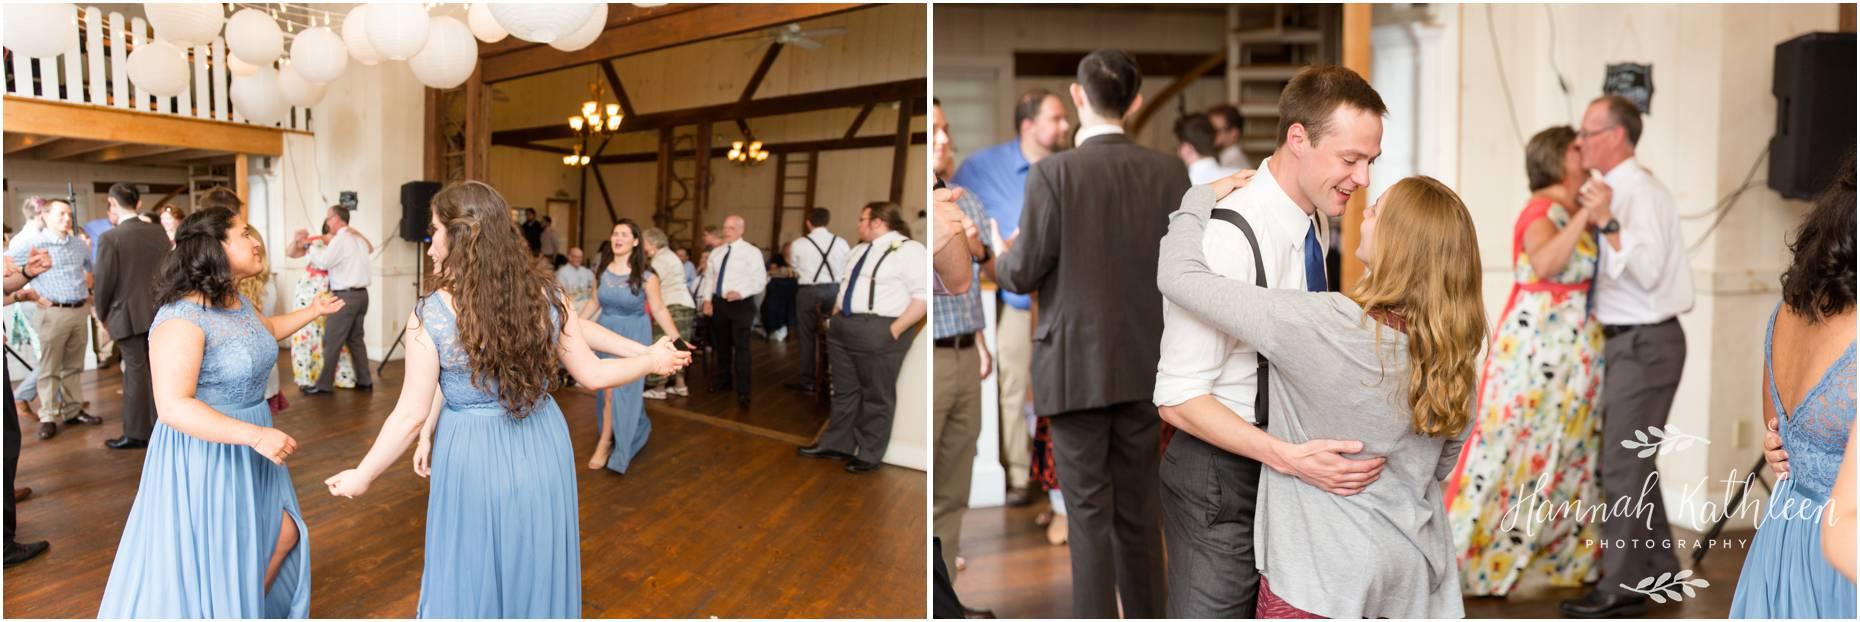 MattAutumn_Pennsylvania_Wedding_Photographer_0001.jpg